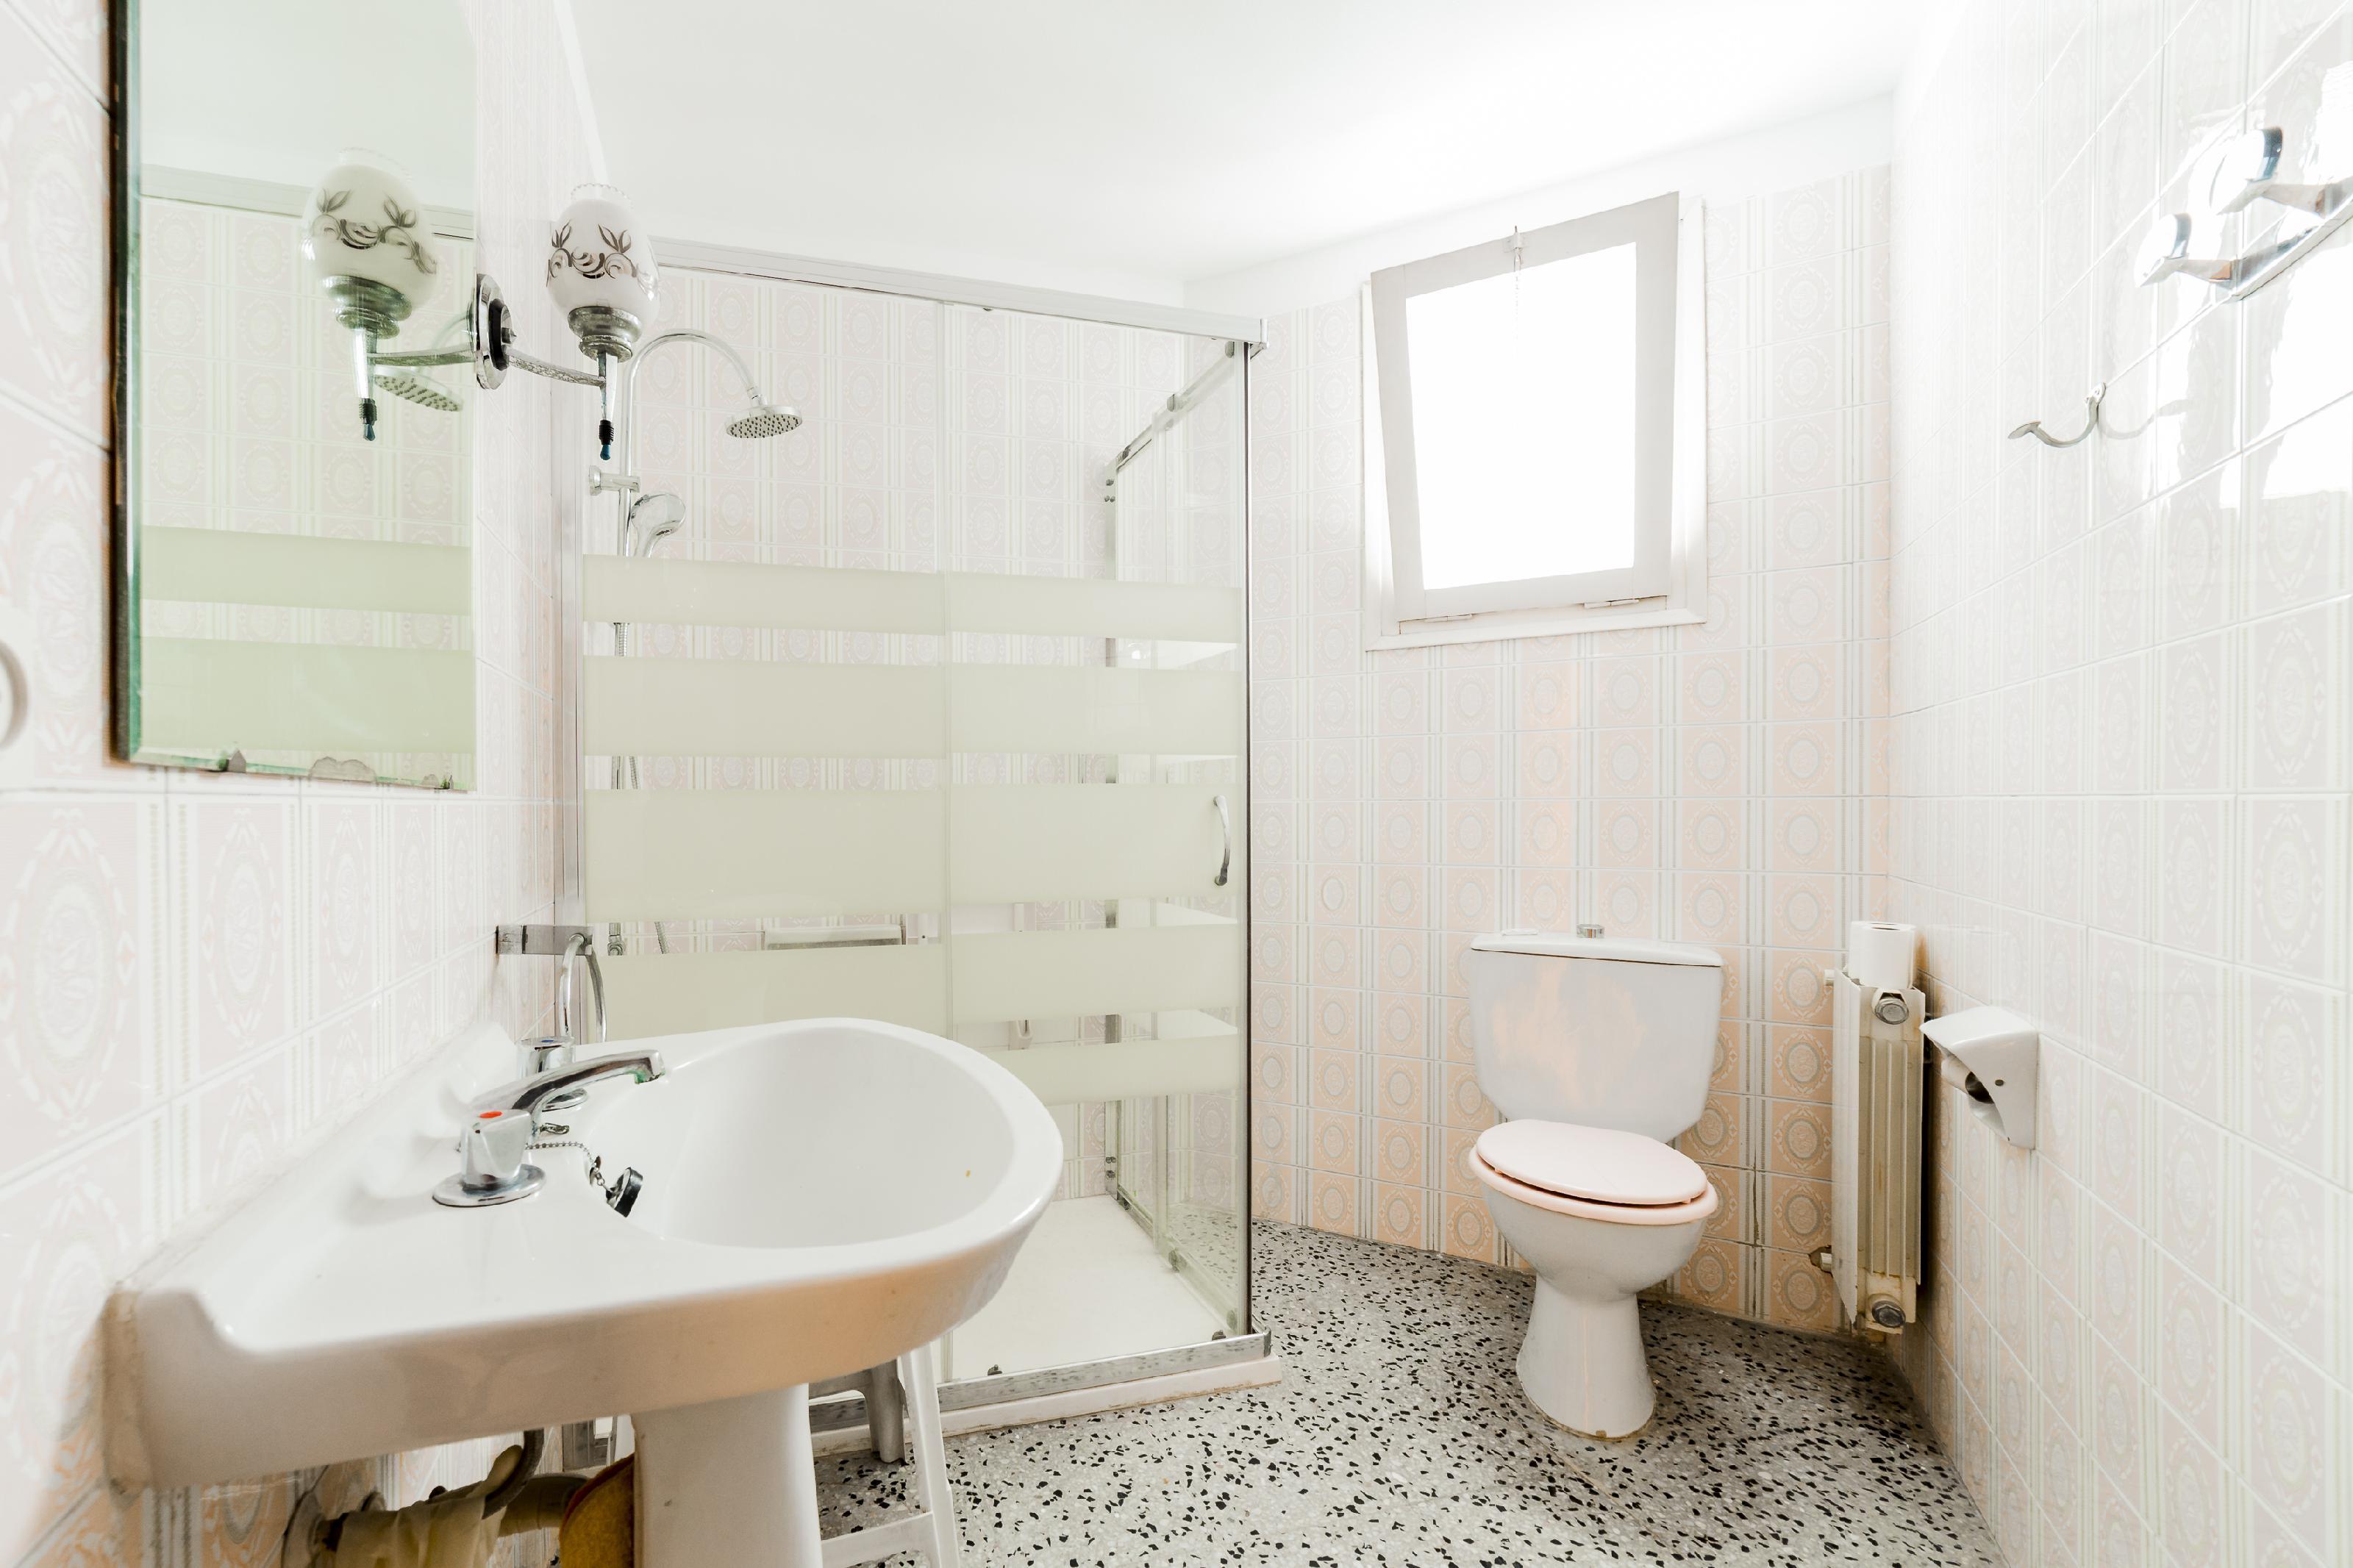 247624 Flat for sale in Eixample, Sant Antoni 24